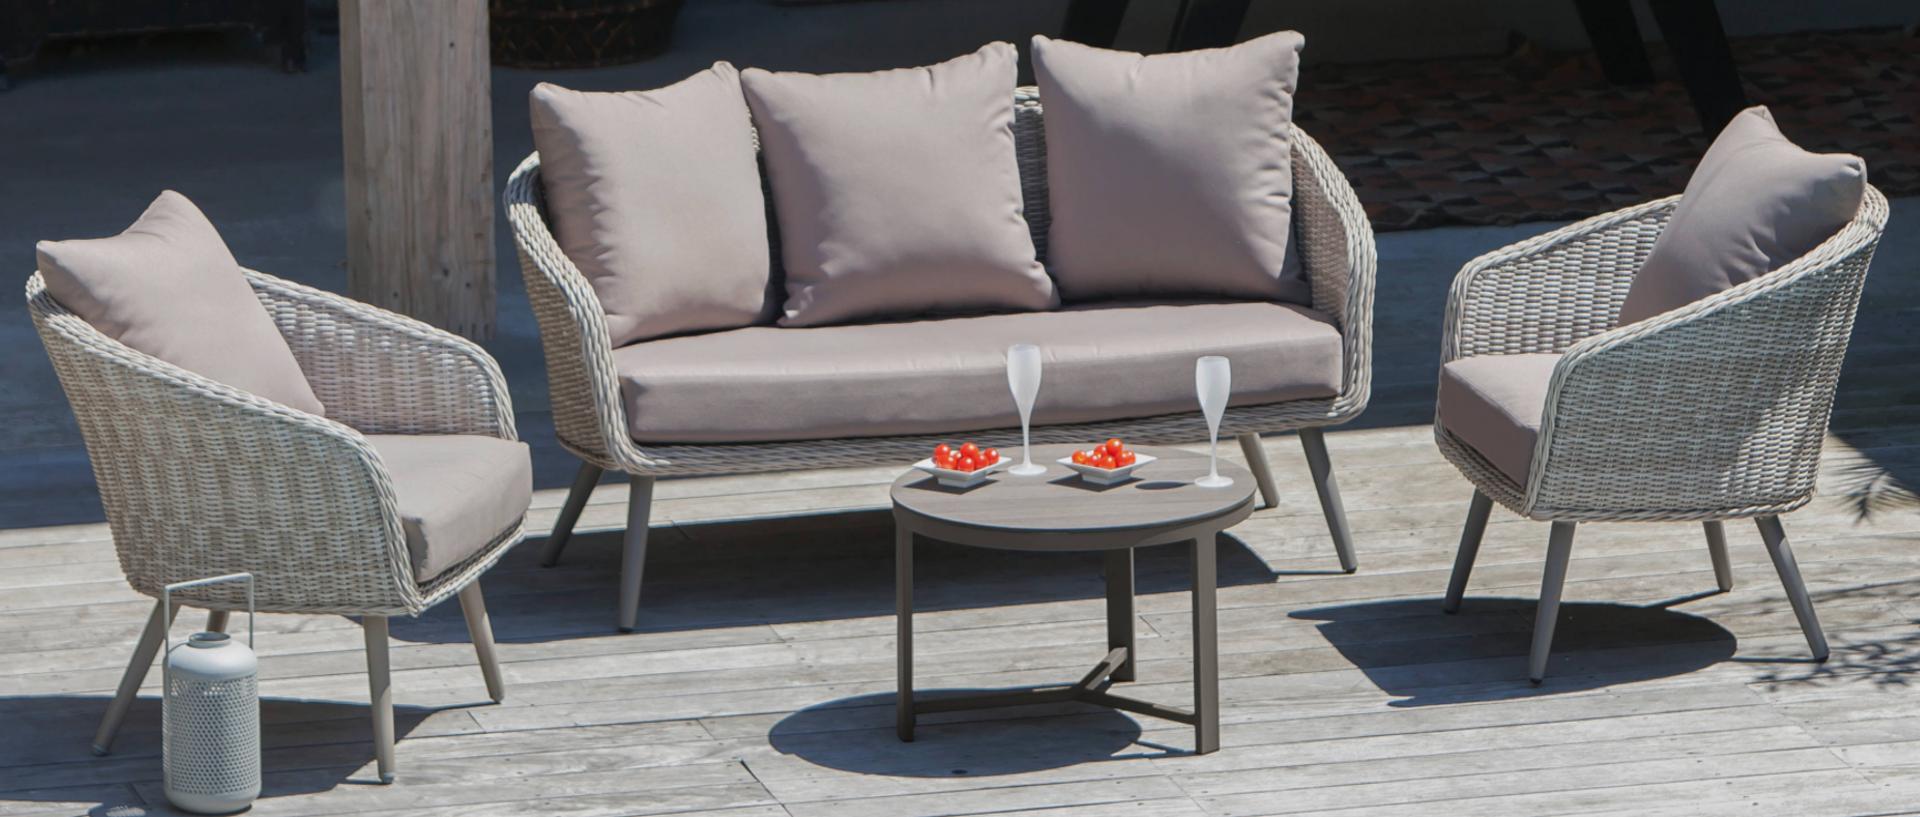 Augusta salon canapé + fauteuils + Tb